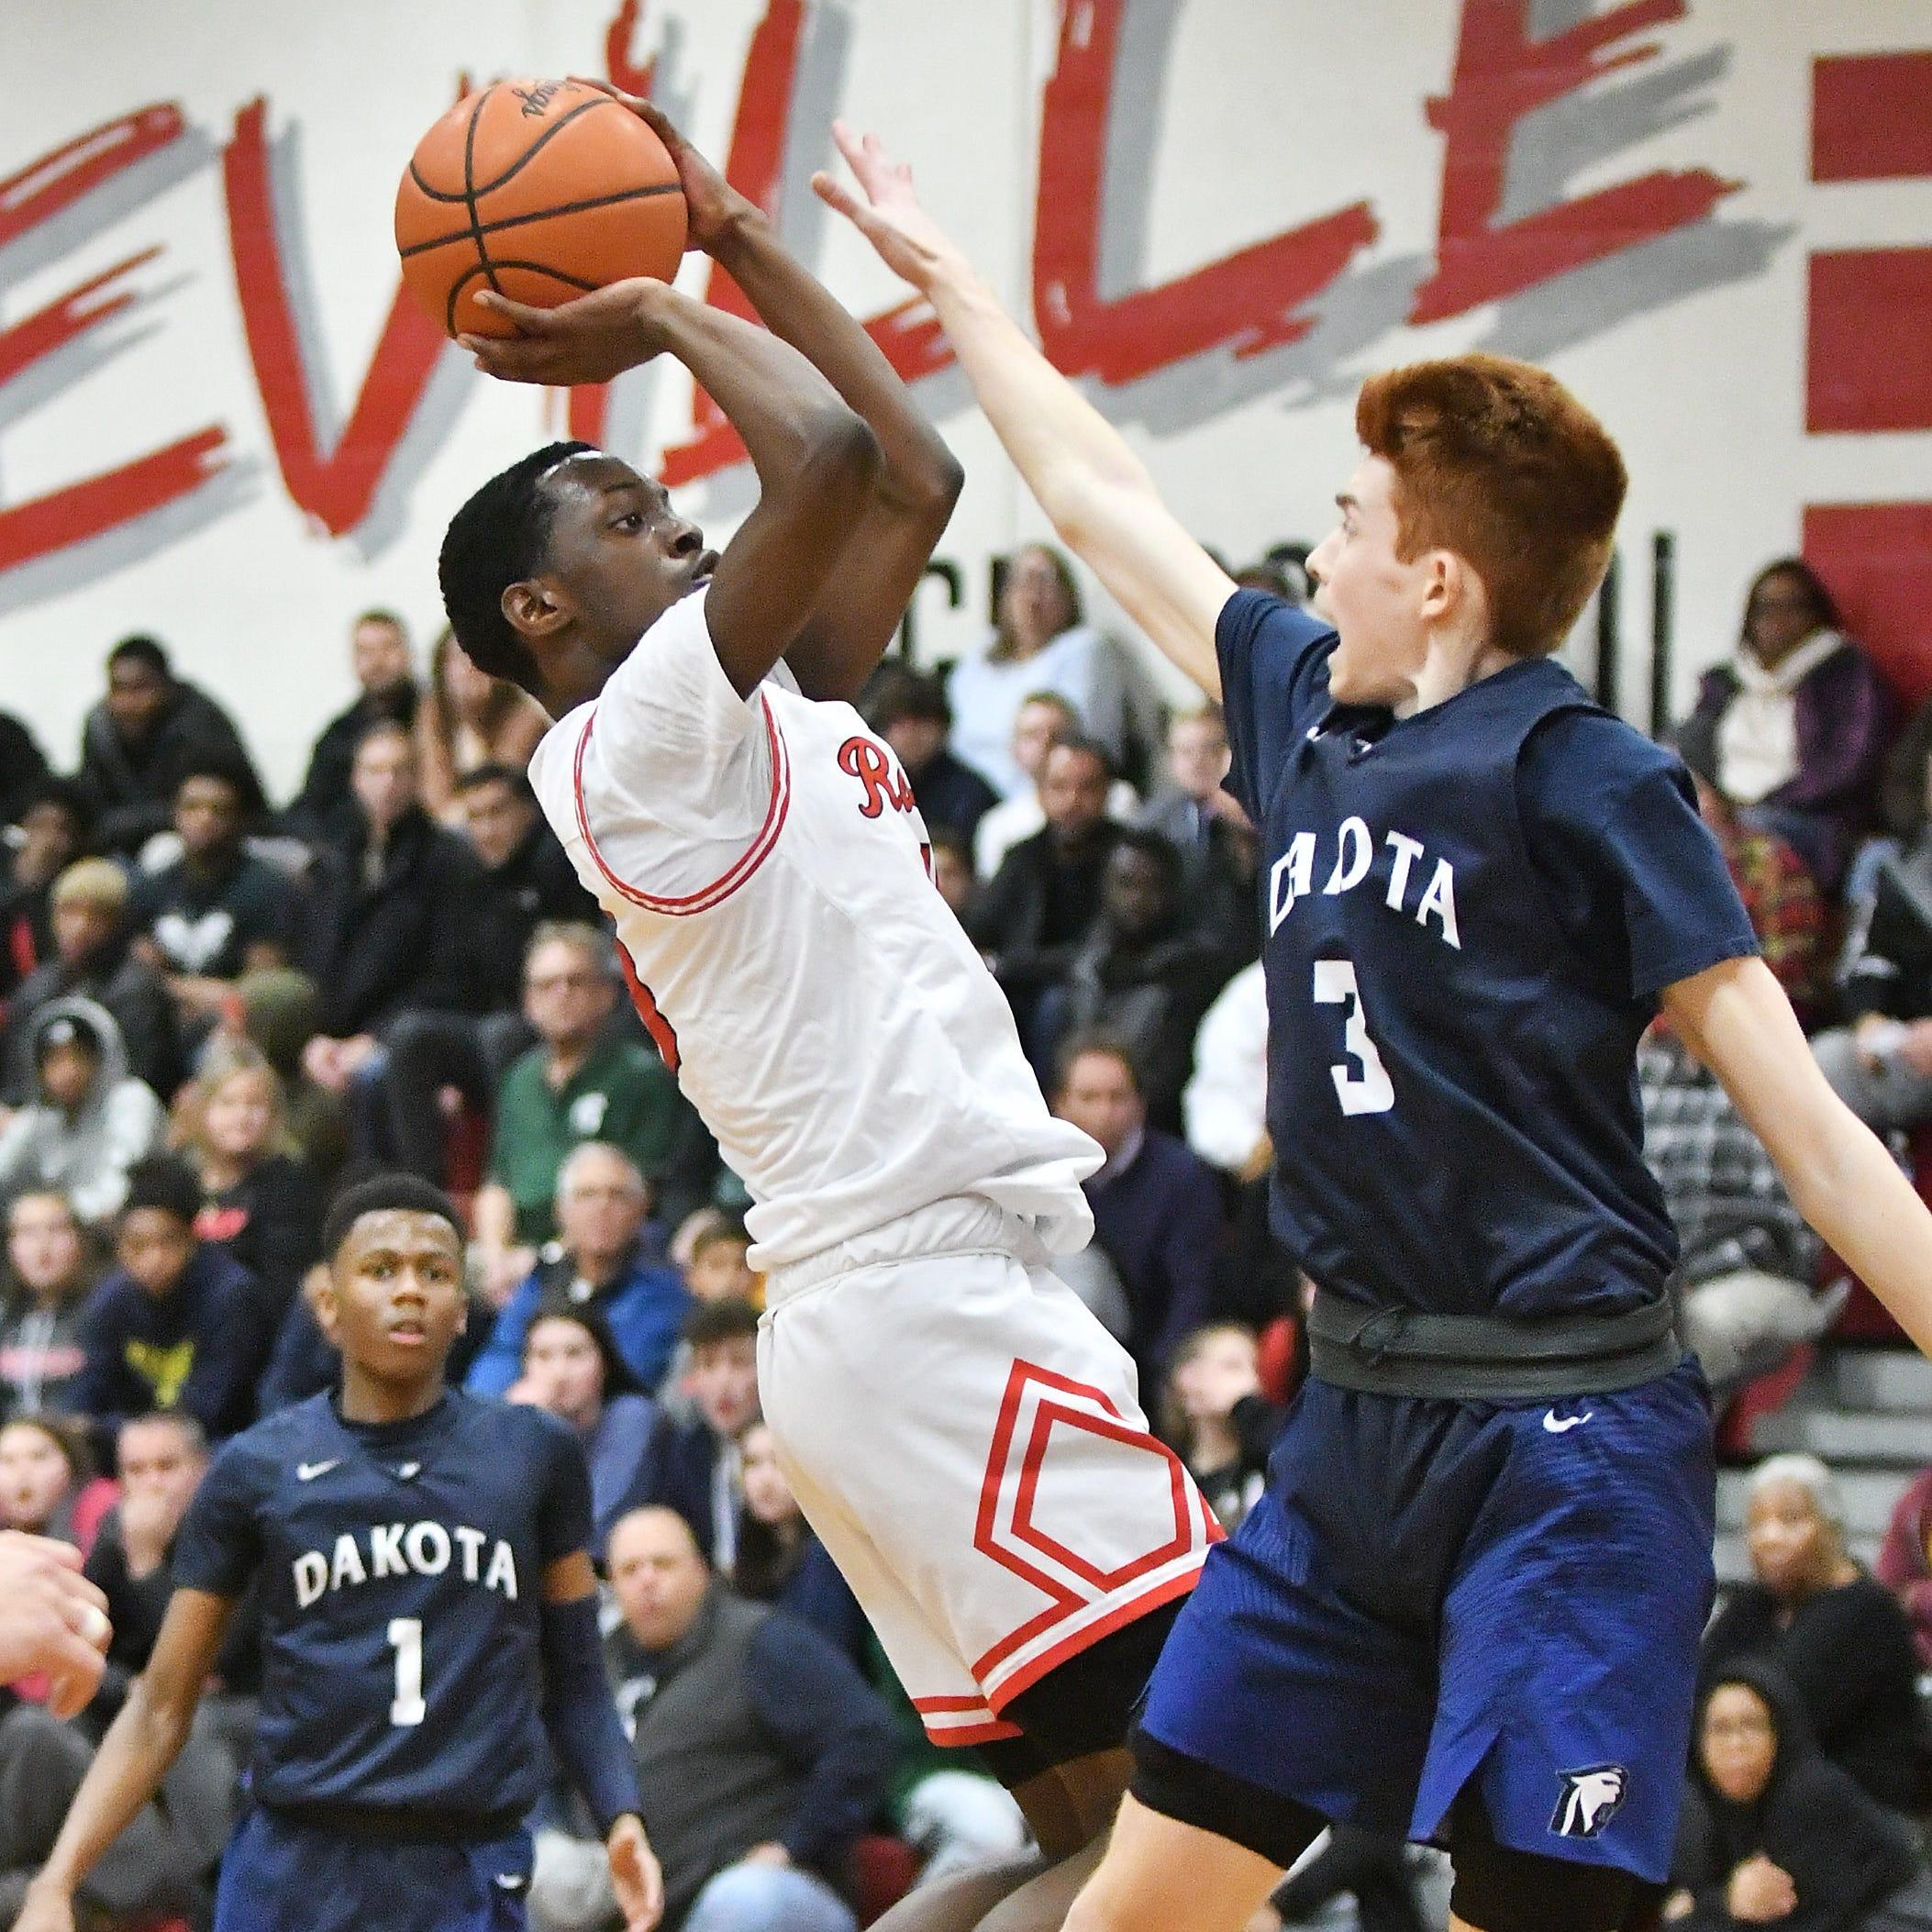 David Goricki's boys high school basketball rankings: Jan. 20